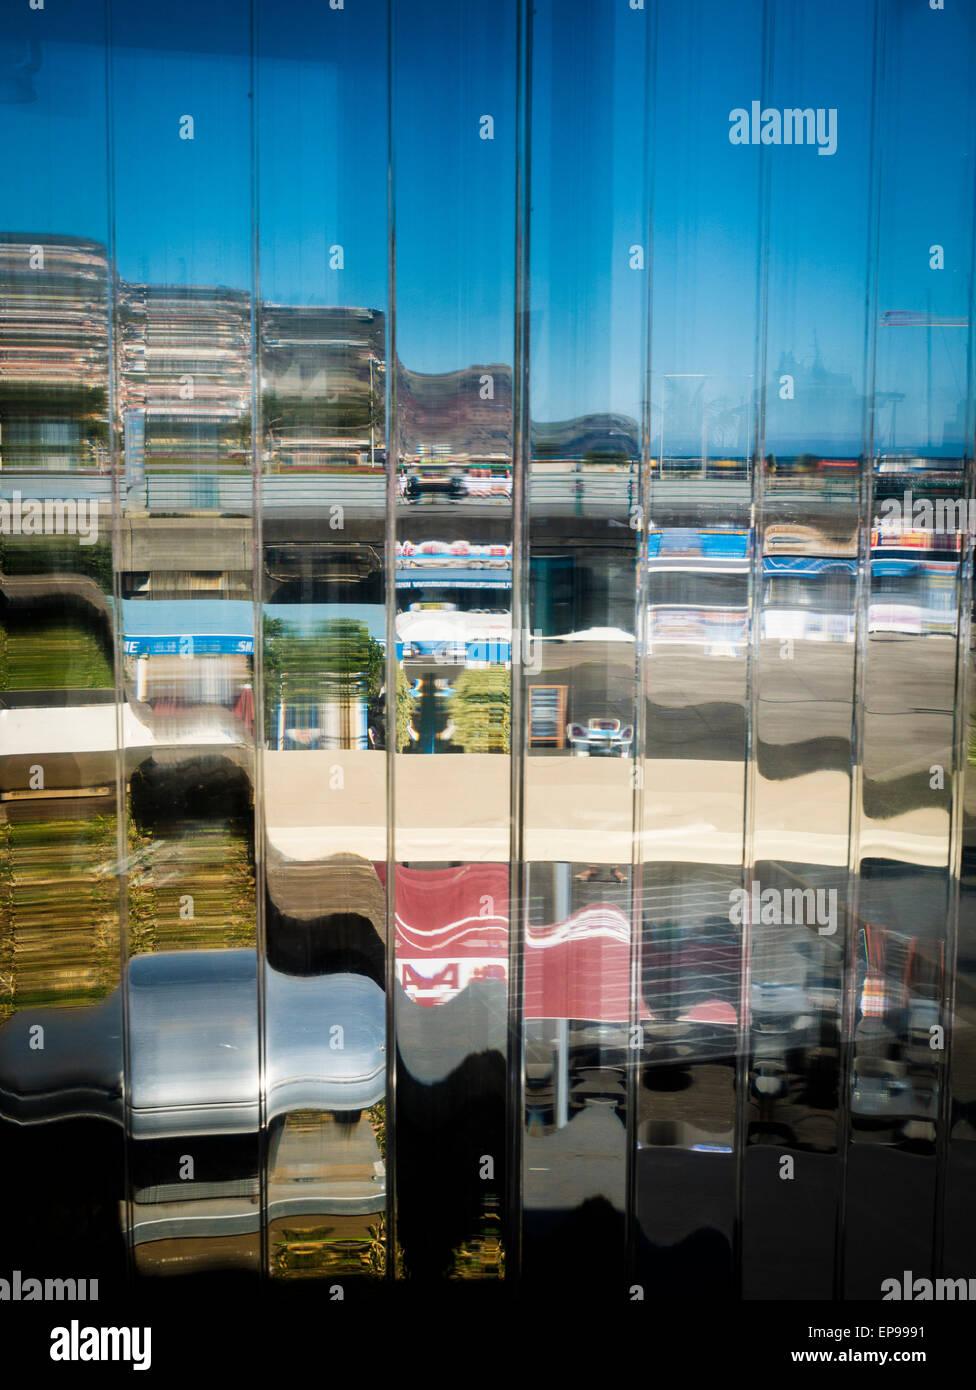 Glass Screen, Marina, Funchal, Madeira, Portugal - Stock Image